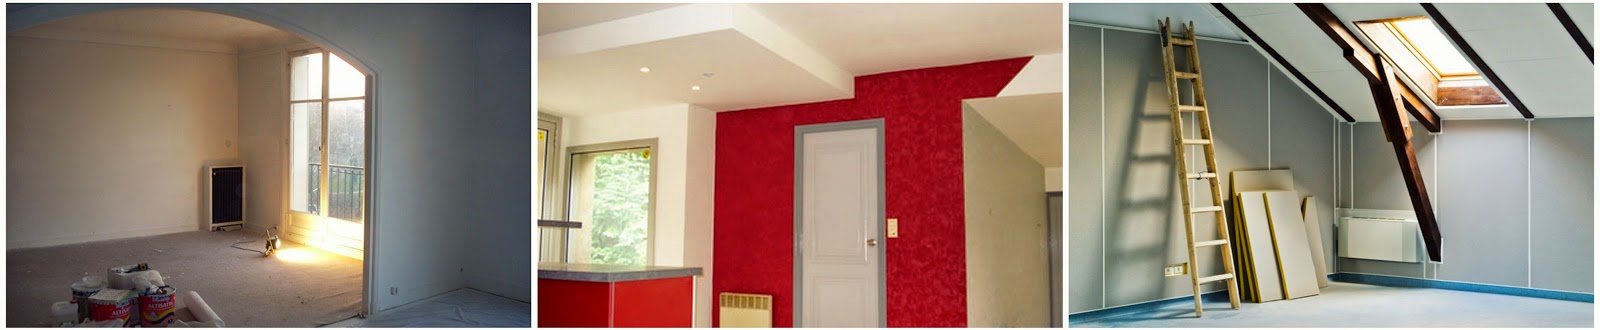 prix renovation peinture appartement au m2 l 39 artisan peintre lehmanerenove. Black Bedroom Furniture Sets. Home Design Ideas